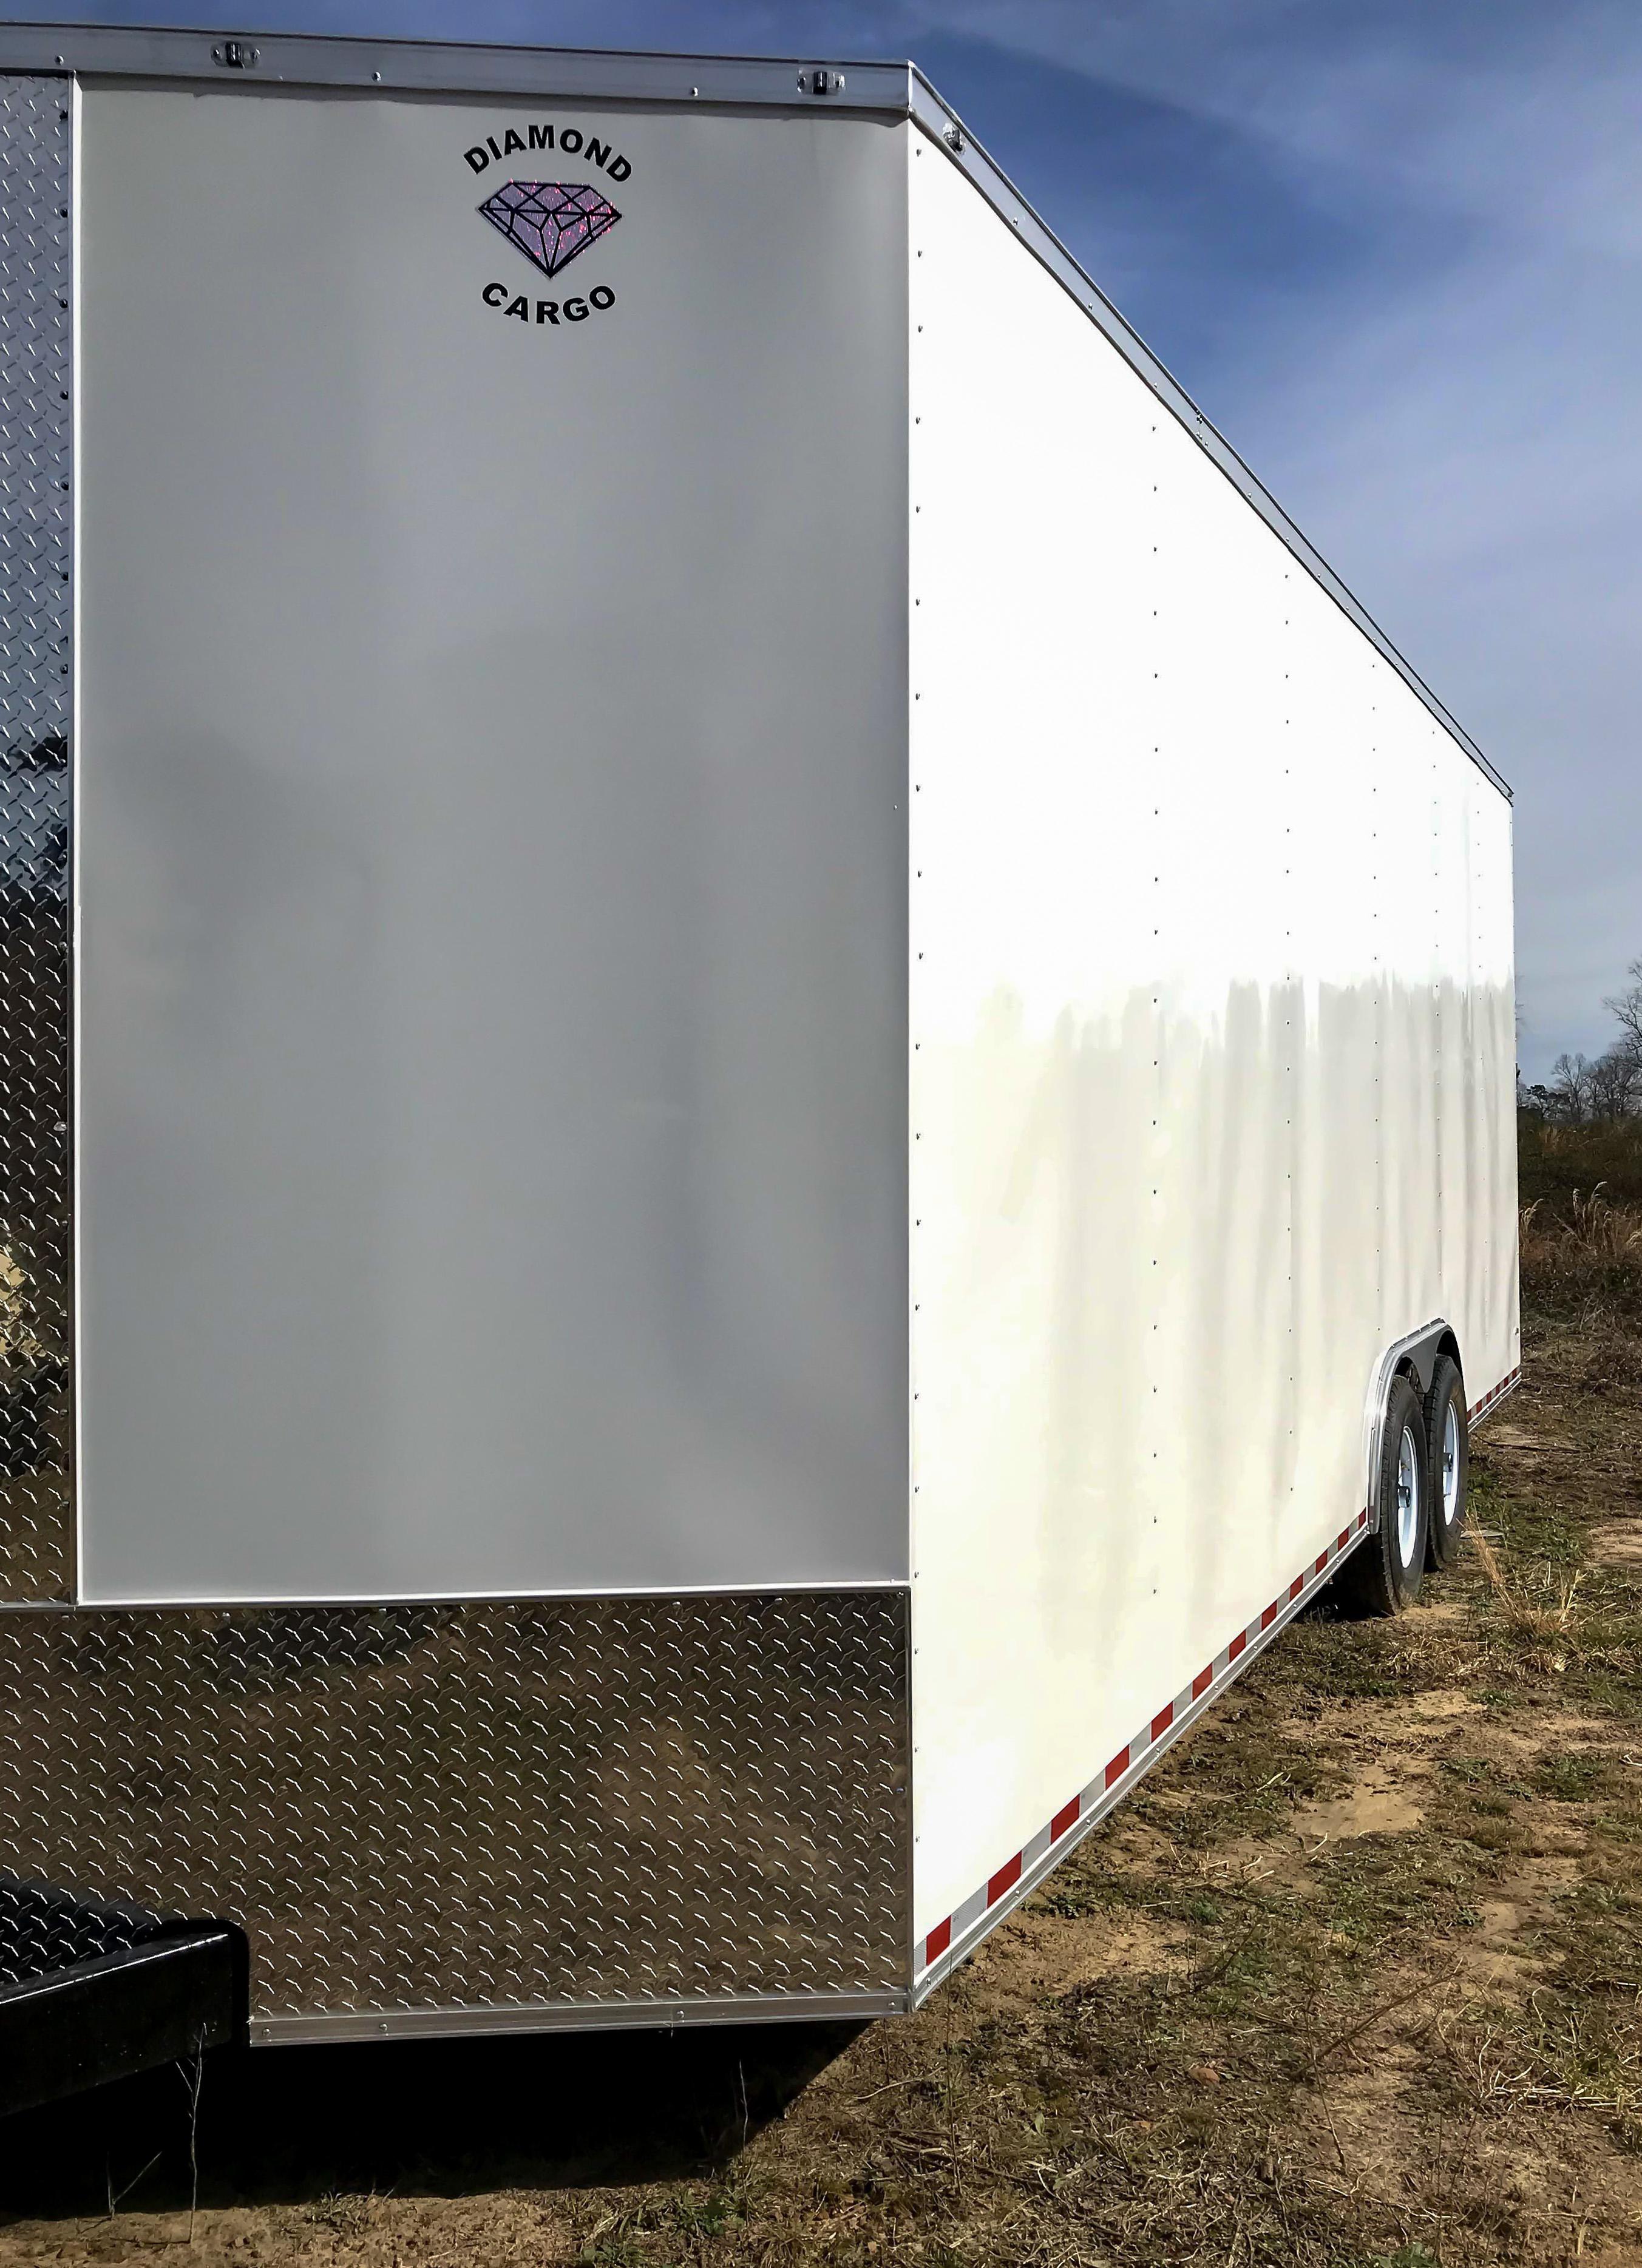 New upgrade trailer